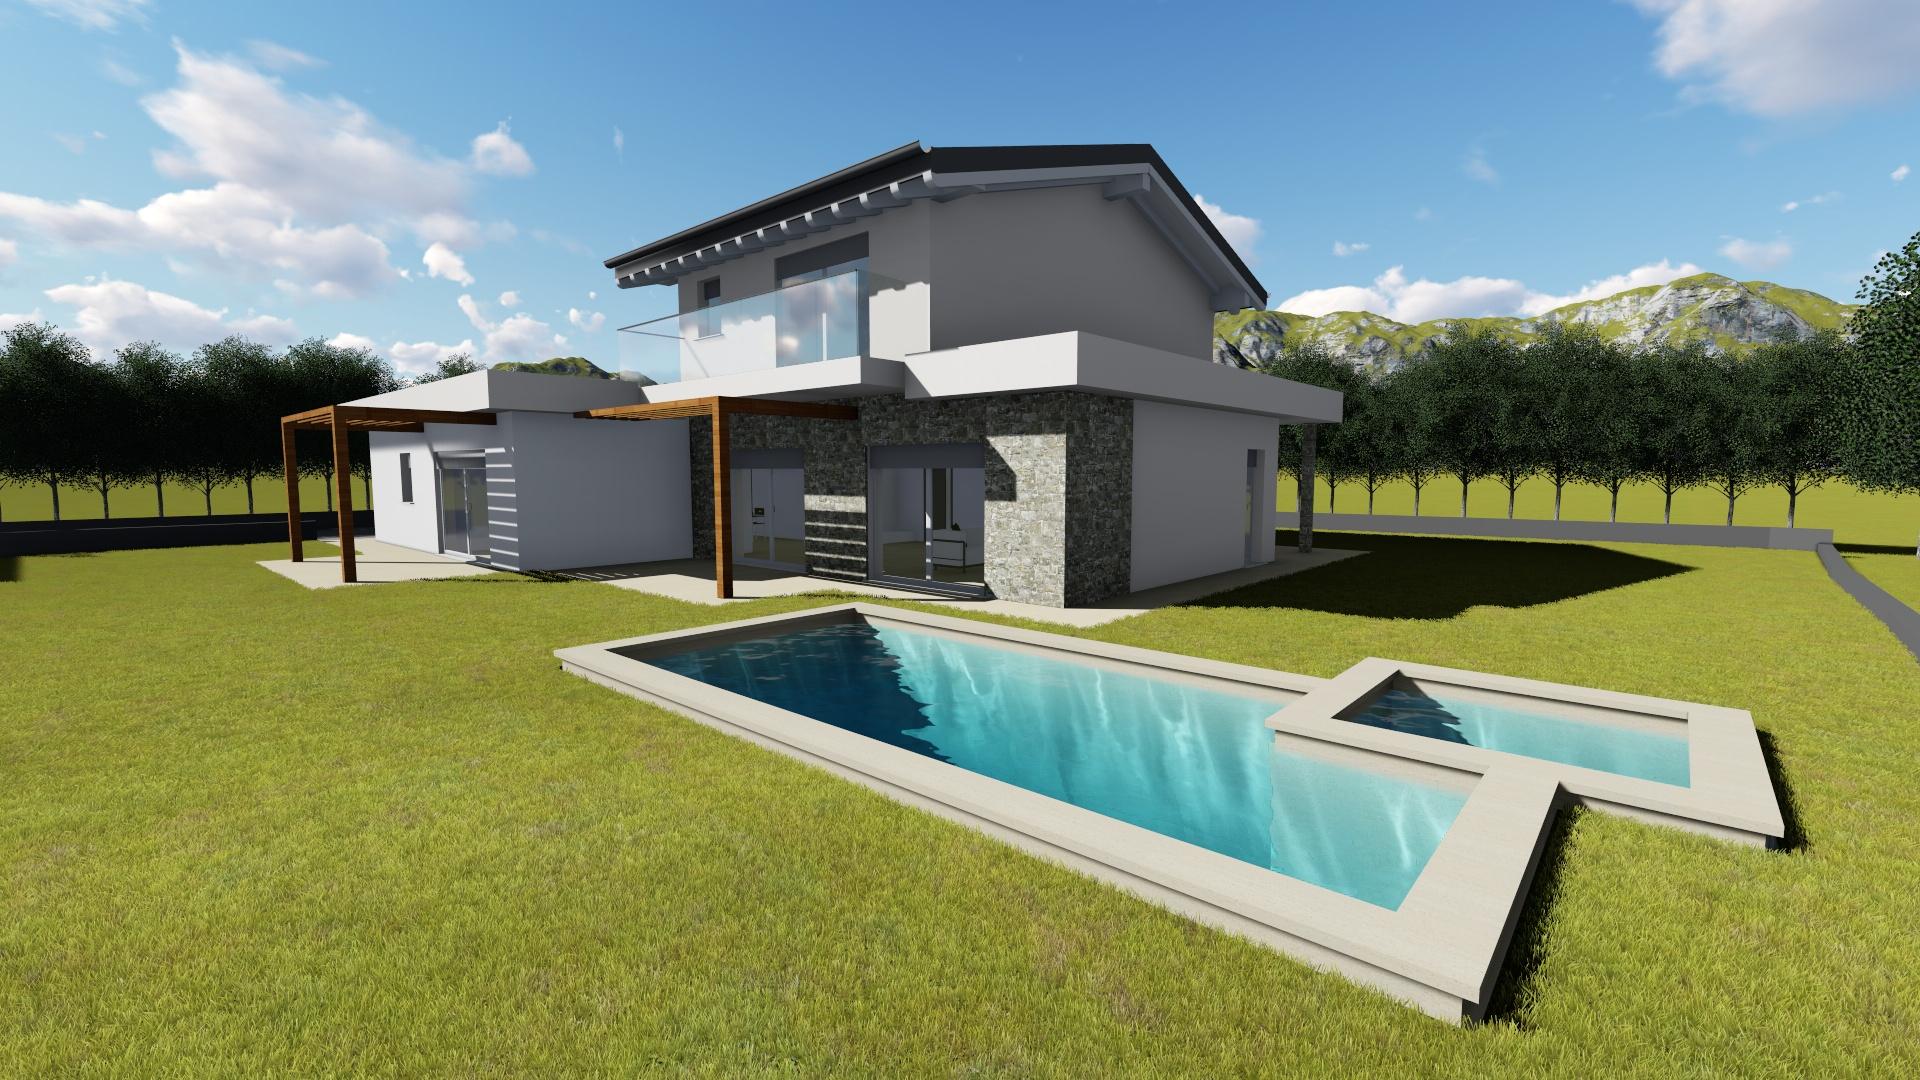 villa x lam bifamiliare su due piani cornago varese